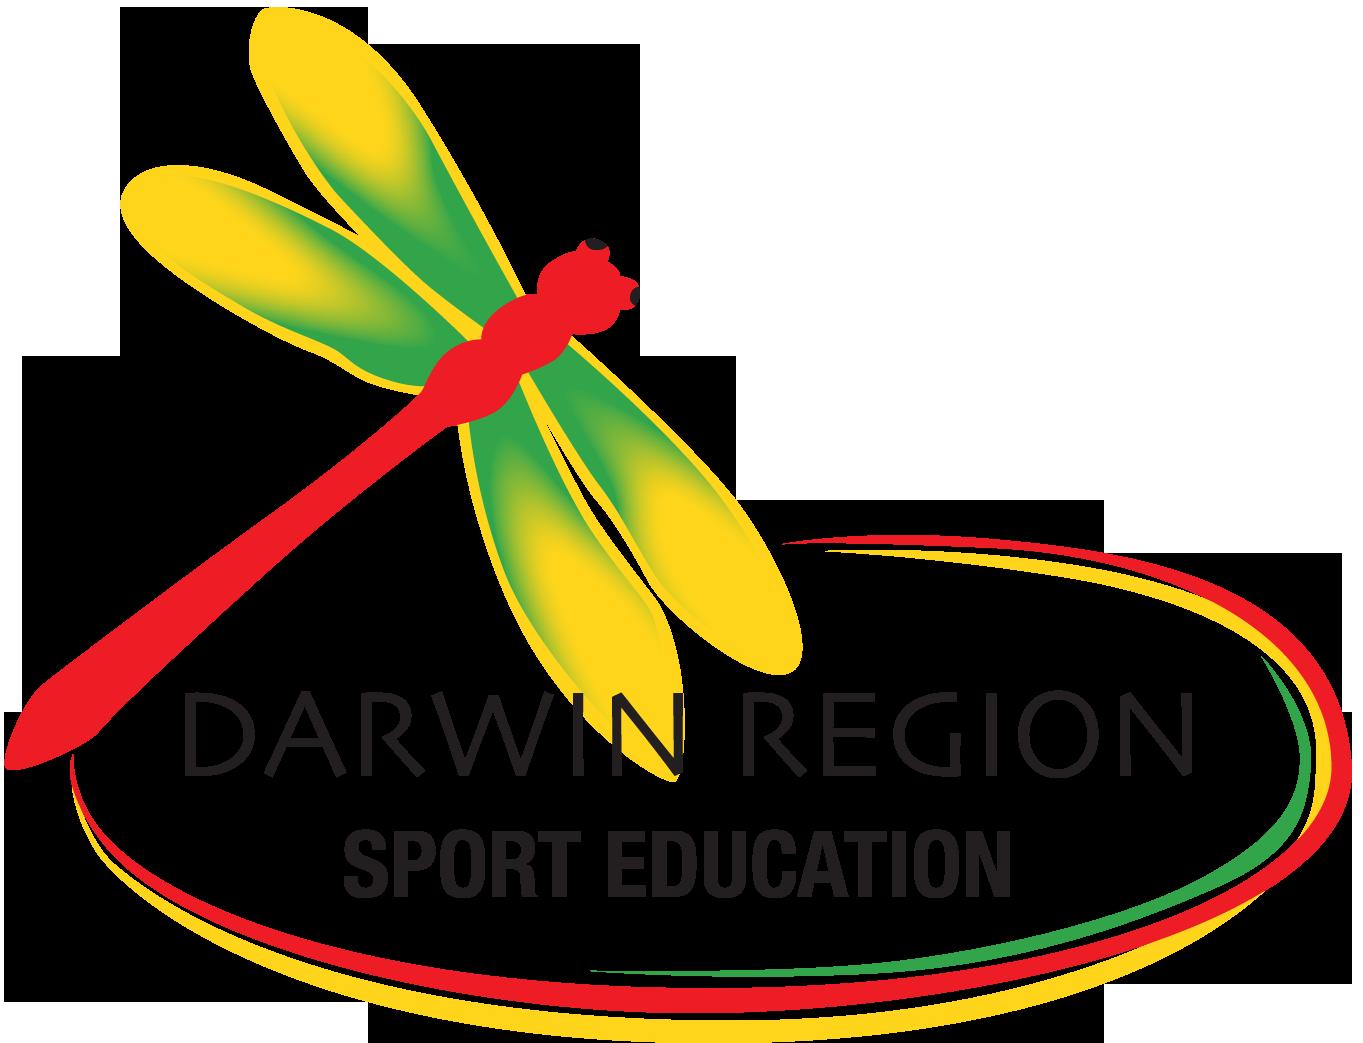 SSNT Darwin region logo